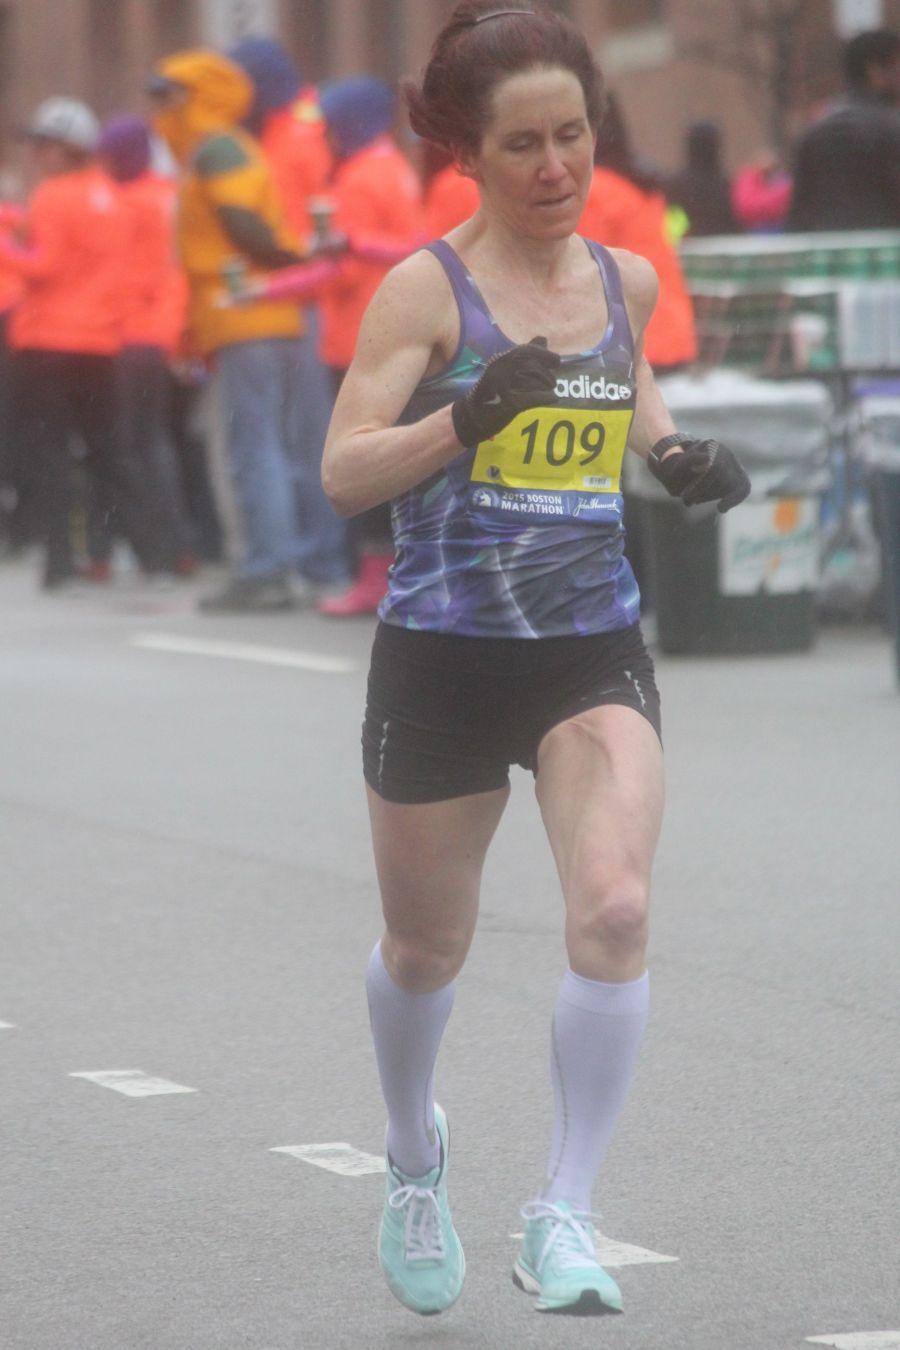 boston marathon april 20 2015 racer number 109